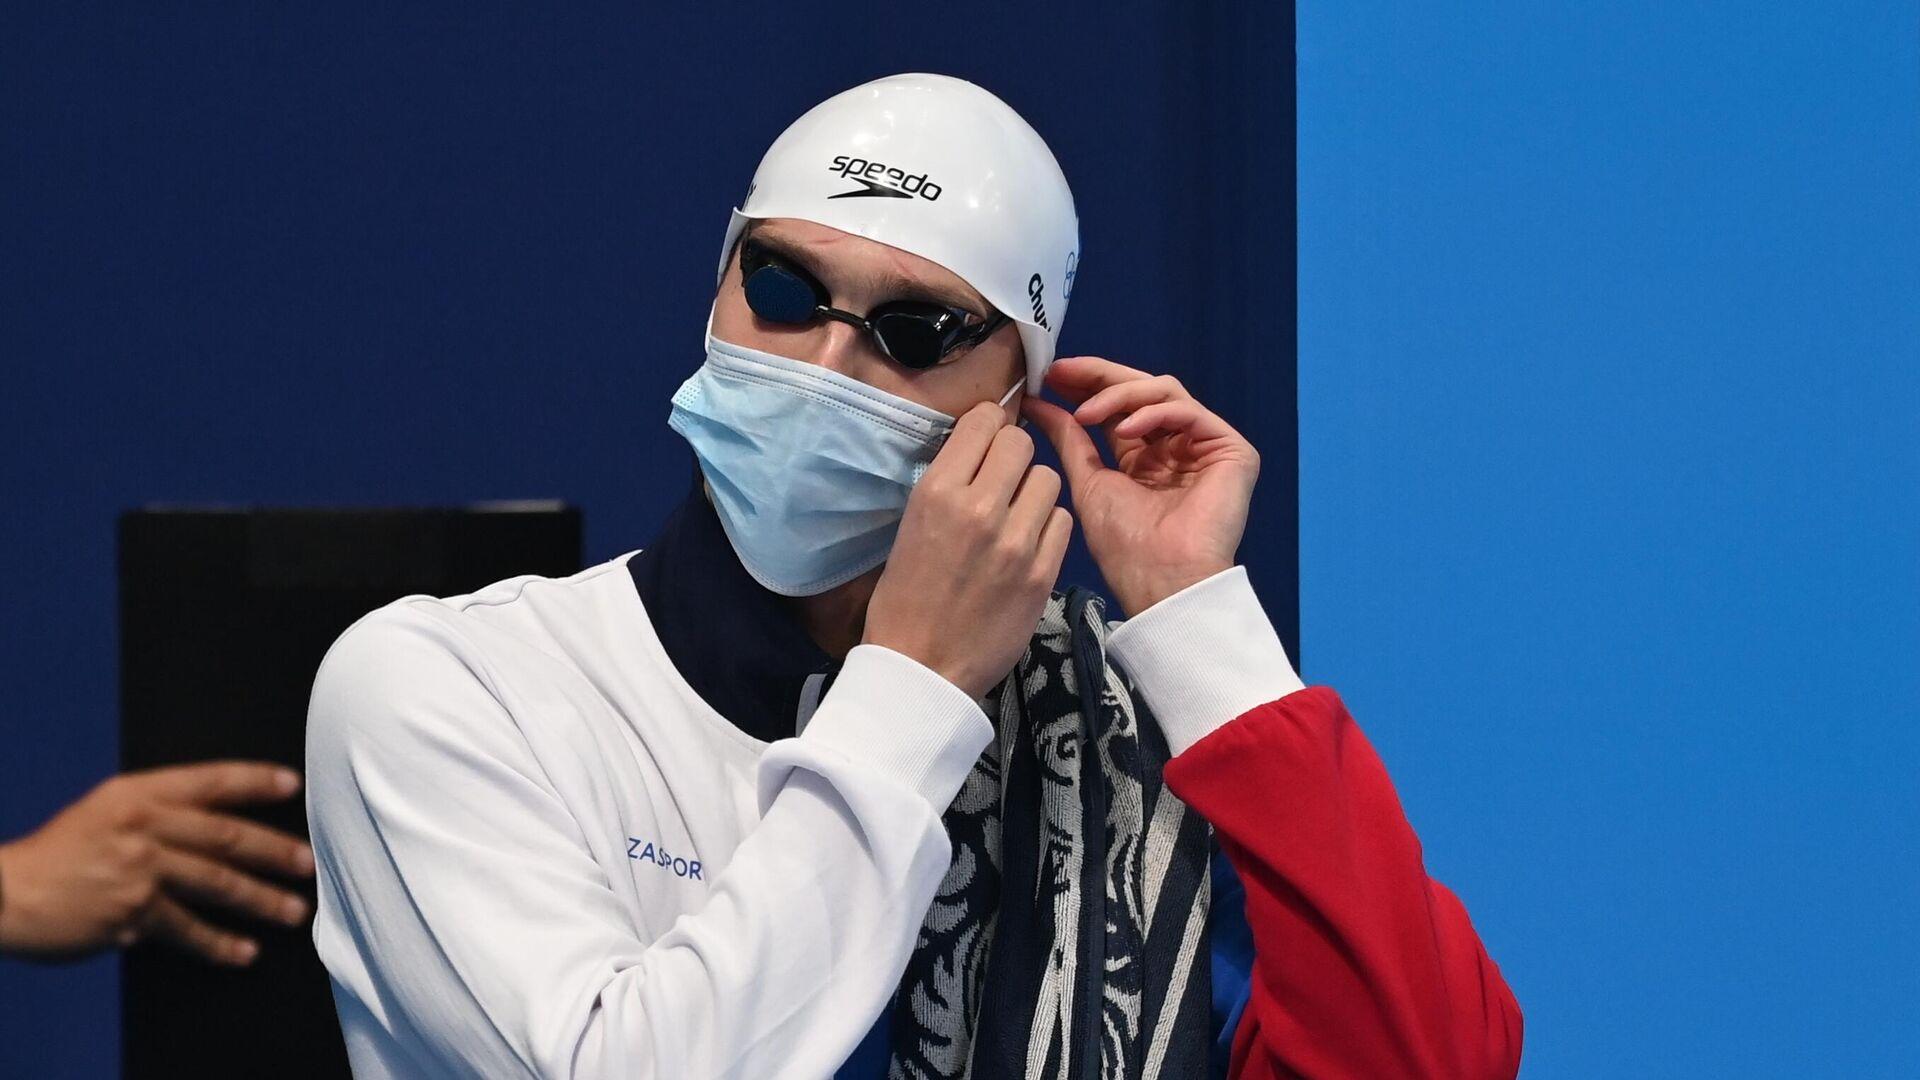 Олимпиада-2020. Плавание. Четвертый день - РИА Новости, 1920, 30.09.2021